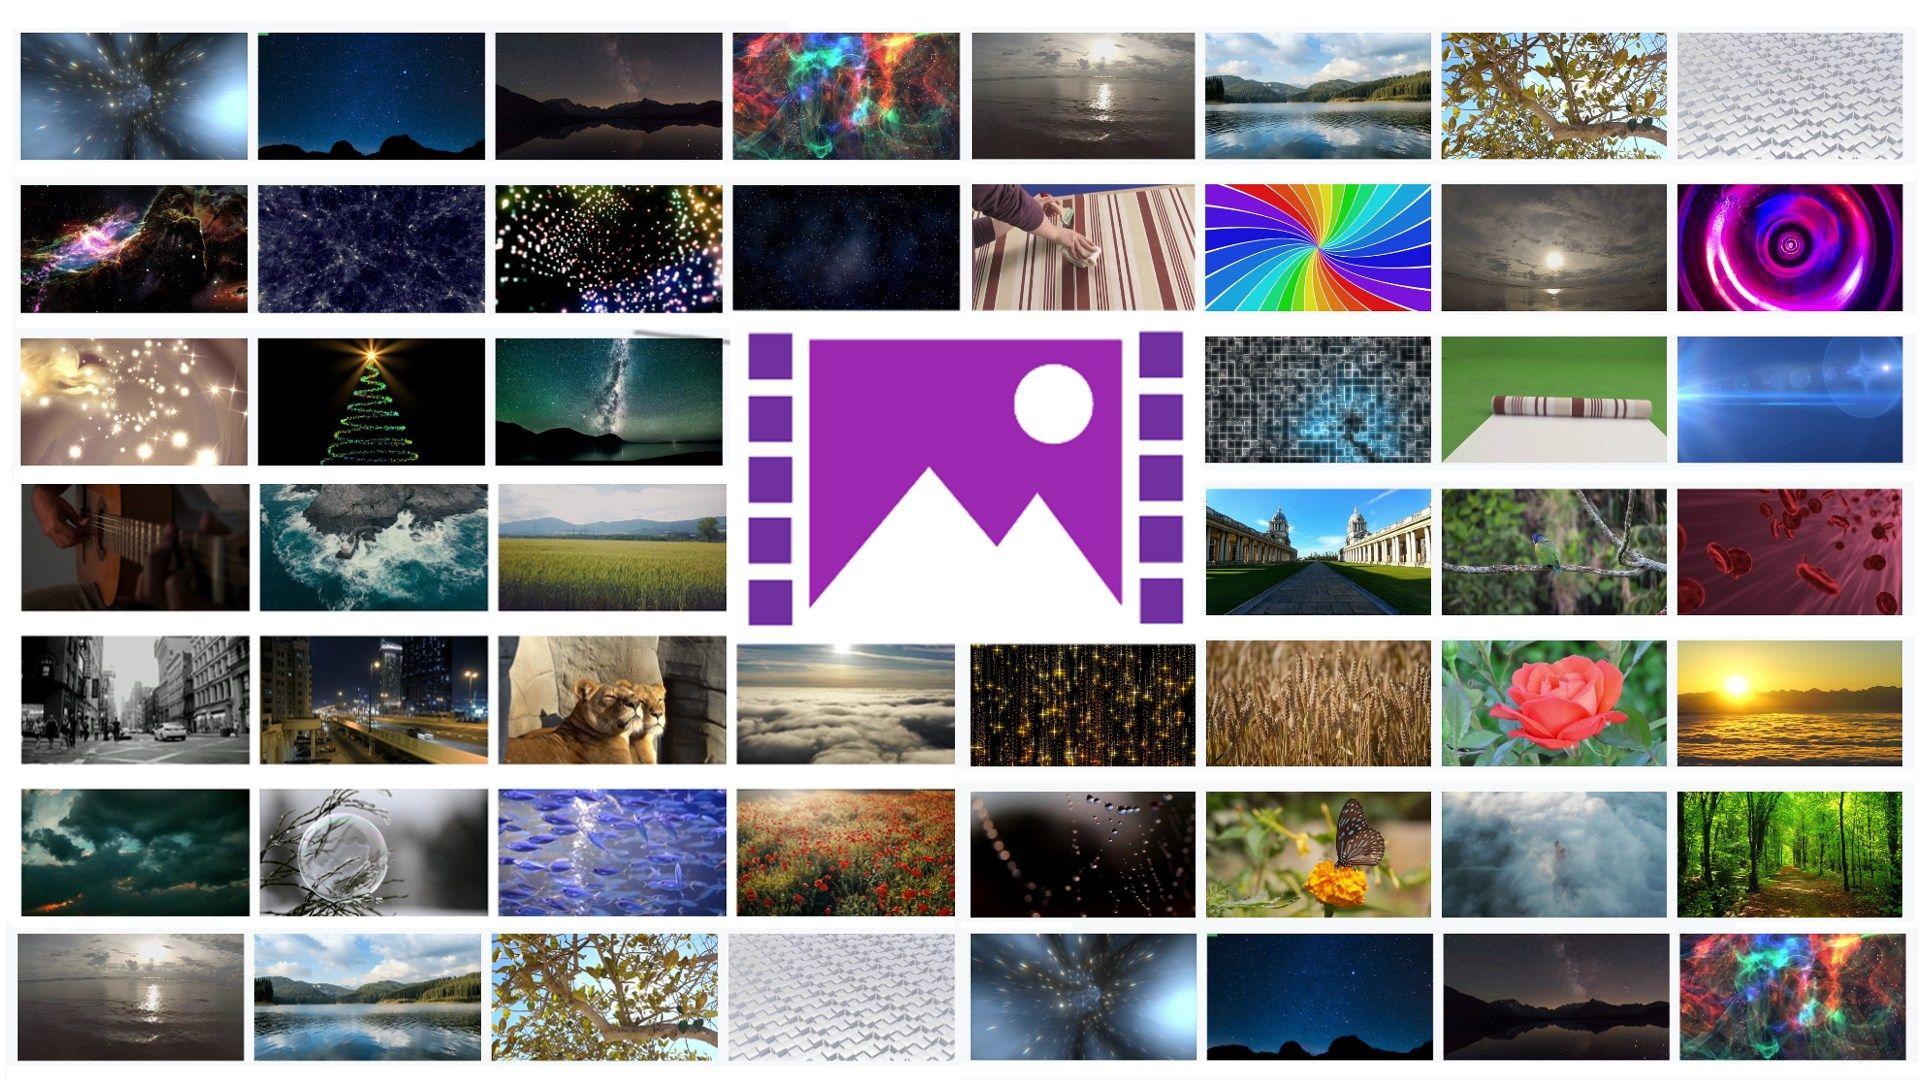 Get Desktop Live Wallpapers Microsoft Store En Au In 2020 Live Wallpapers Desktop Windows Water Live Wallpaper